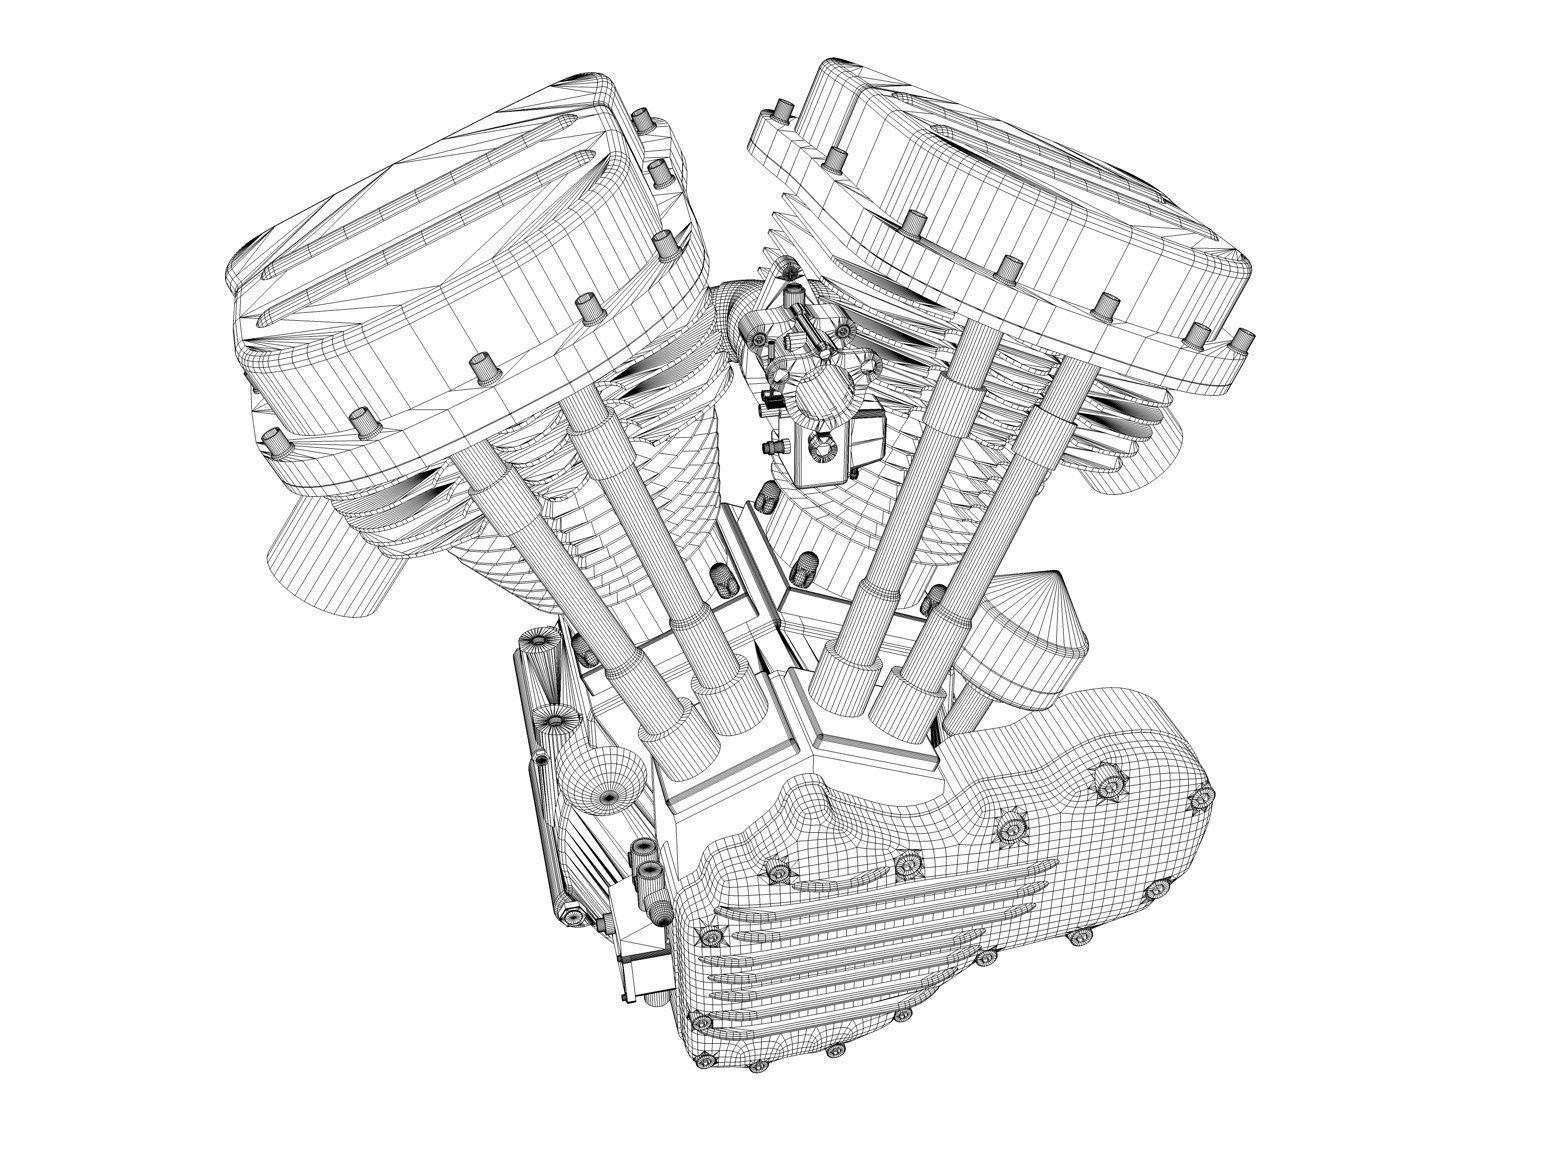 panhead harley motorcycle engine 3d cgtrader Harley Flathead panhead harley motorcycle engine 3d model obj mtl 3ds fbx c4d dxf stl 6